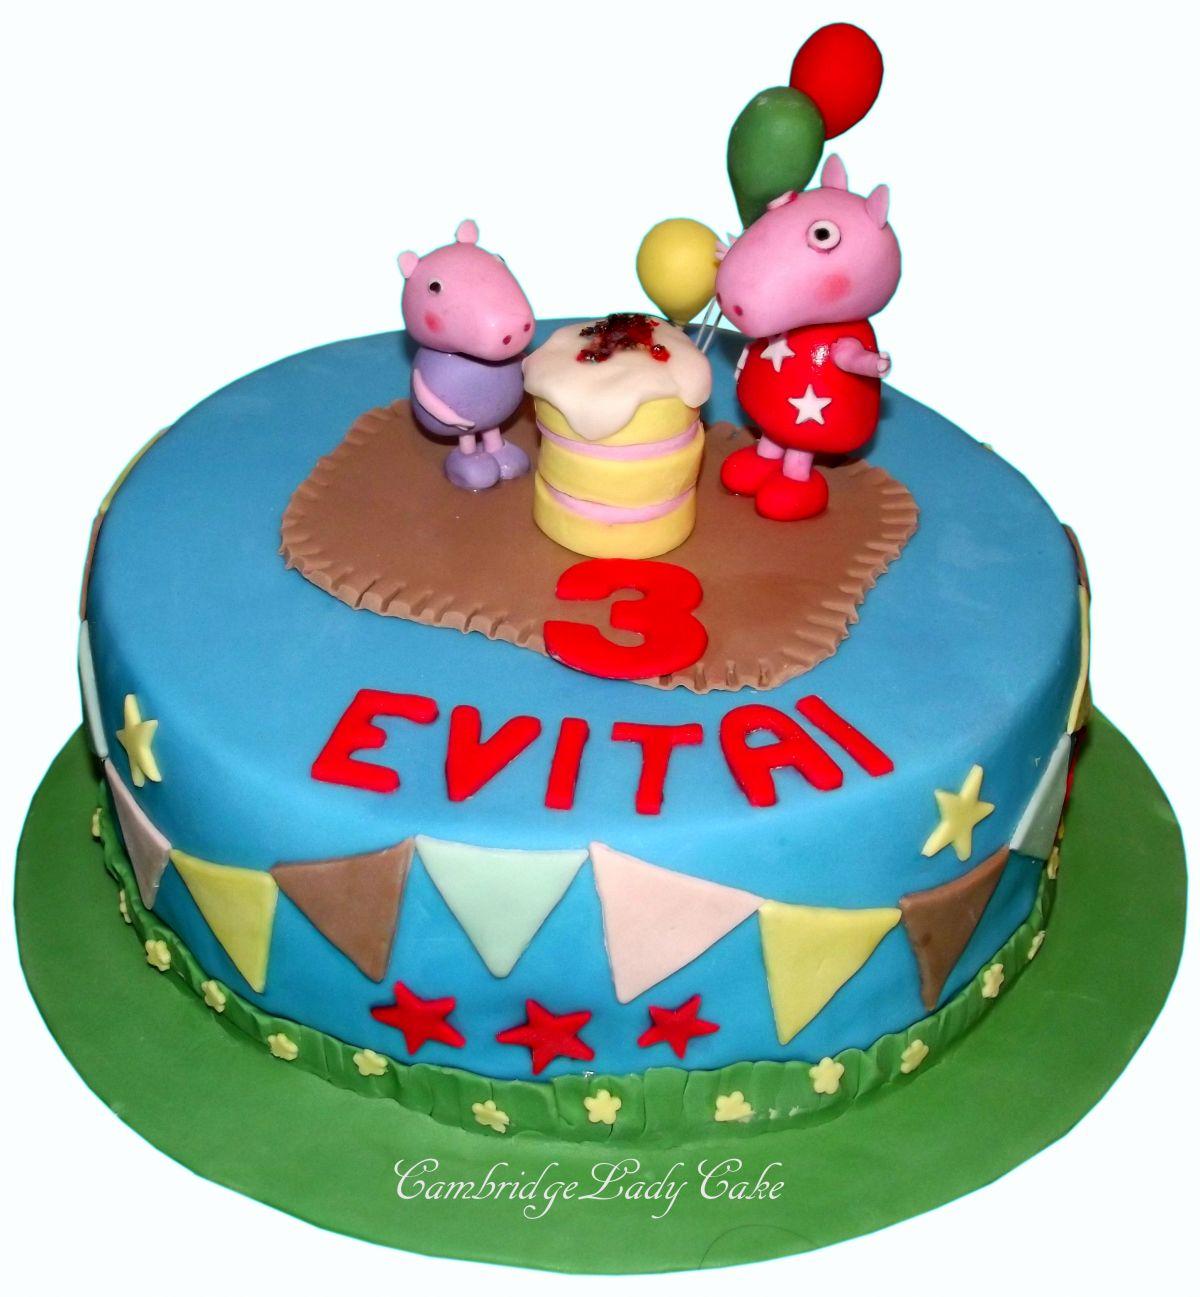 Birthday Celebrations Cambridge Lady Cake